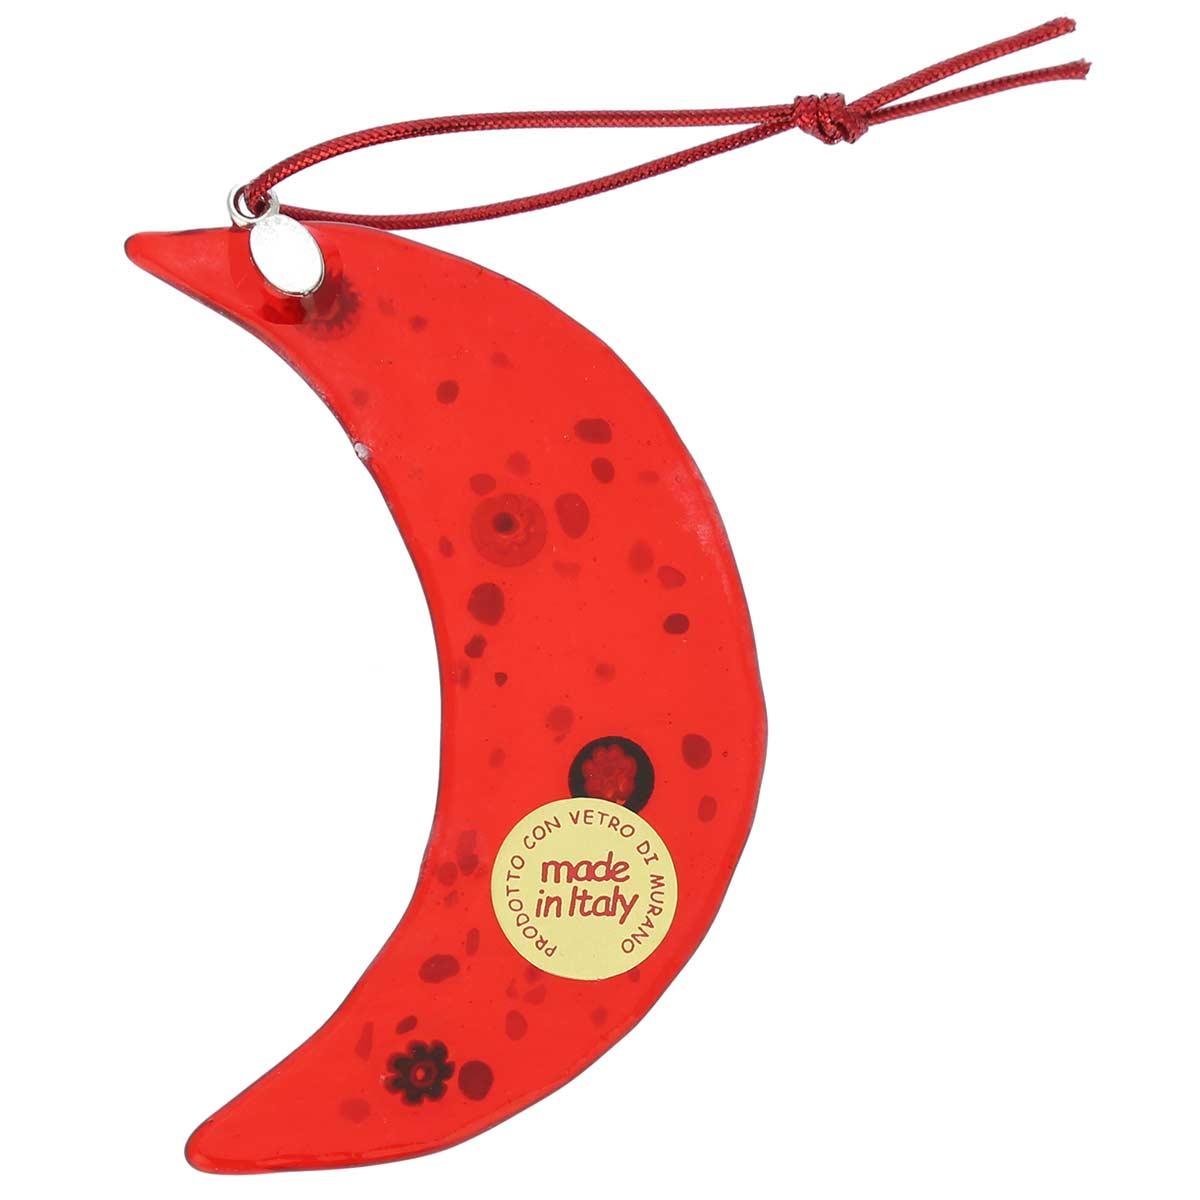 Murano glass moon christmas ornament red - Murano glass ornaments italy ...